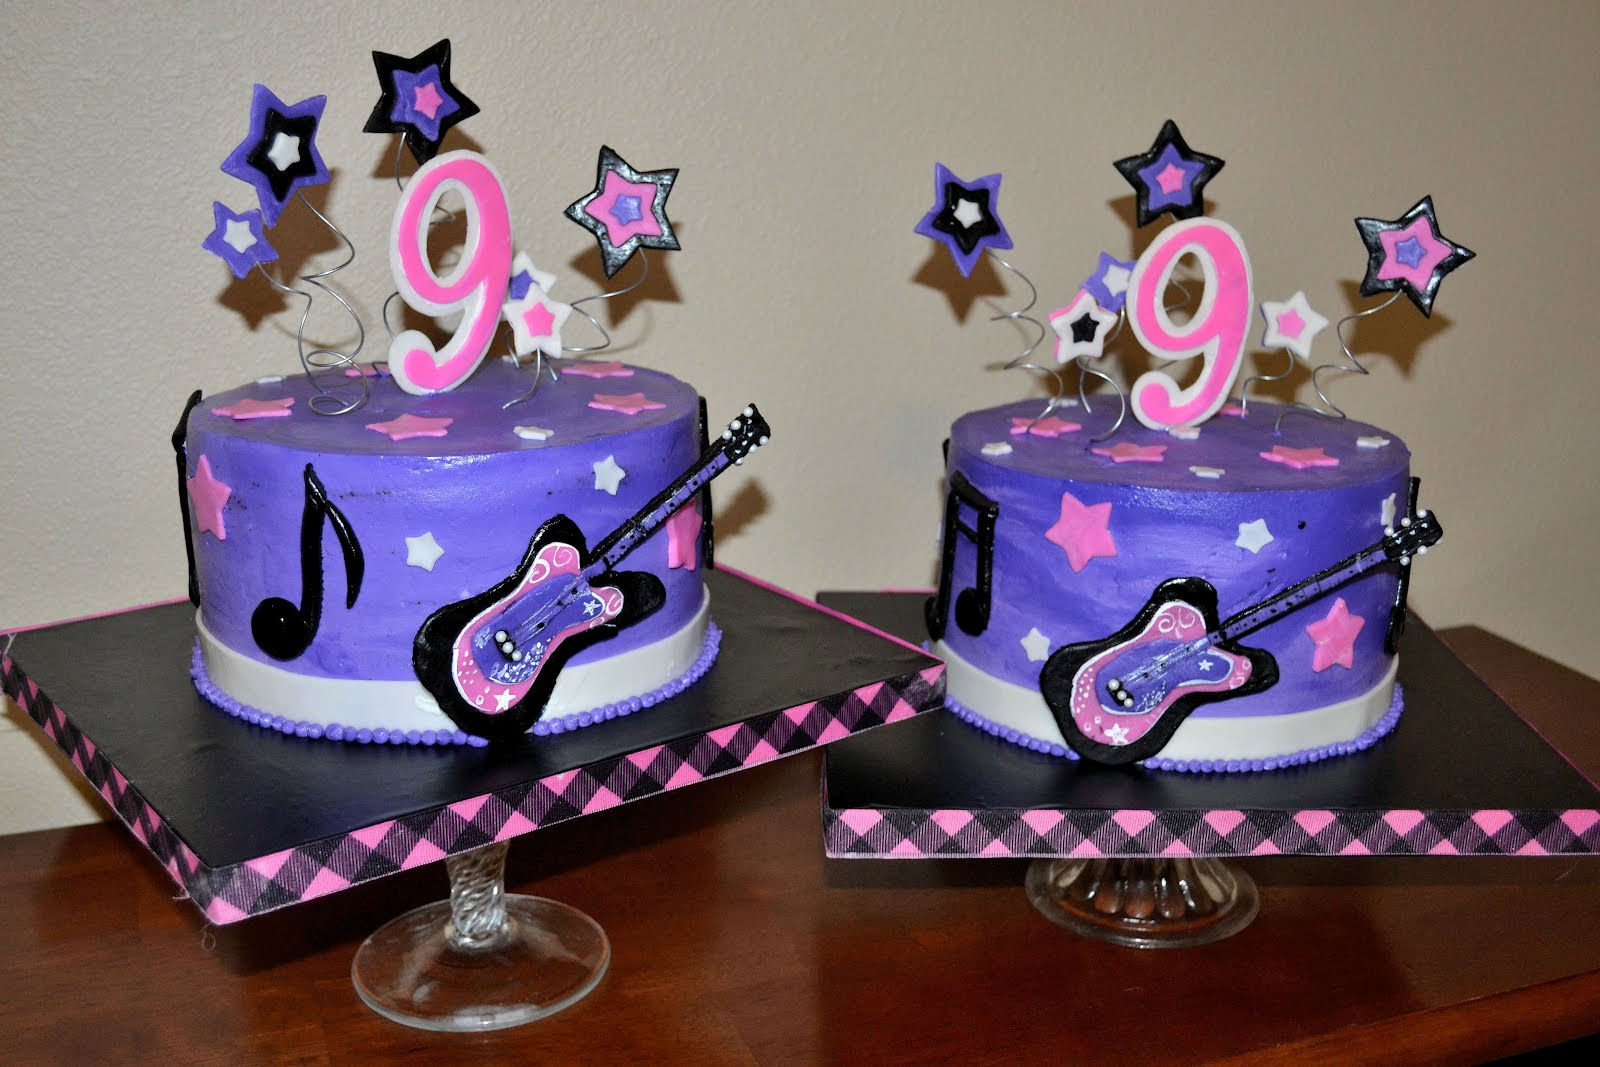 The Shank Family A Rockstar Cake For A Rockstar Birthday Girl